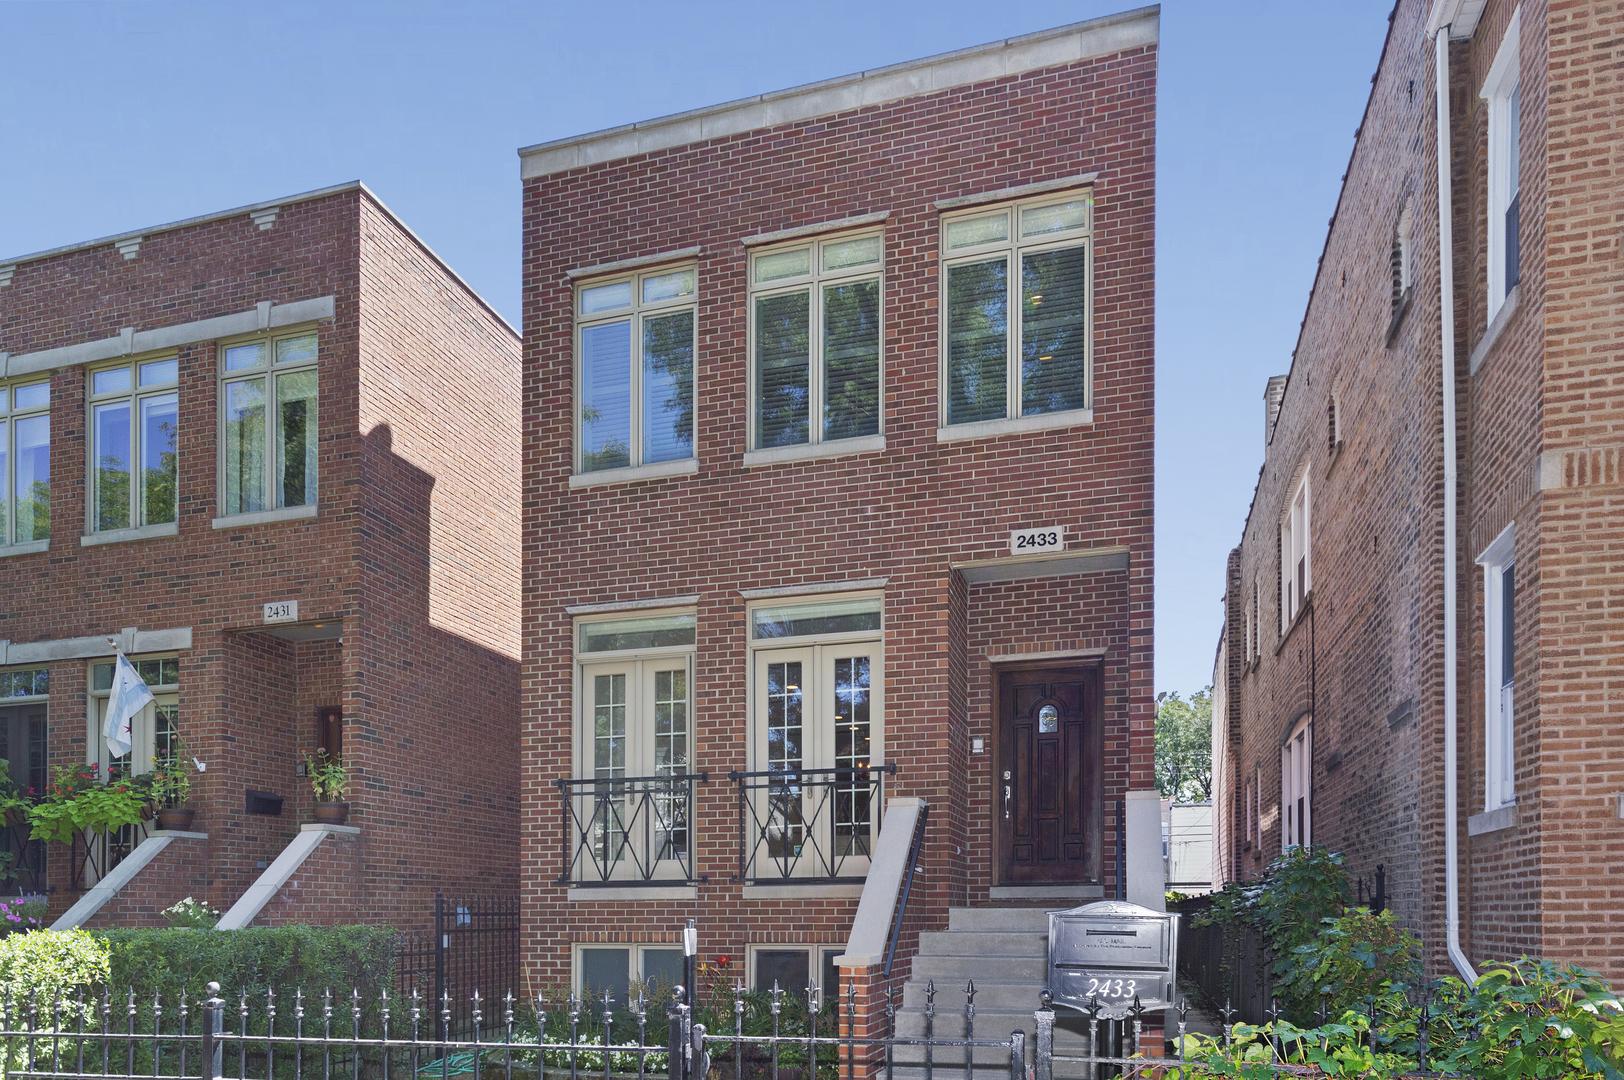 2433 WINONA Street, Chicago, Illinois 60625, 4 Bedrooms Bedrooms, ,4 BathroomsBathrooms,Detached Single,For Sale,WINONA,10909963